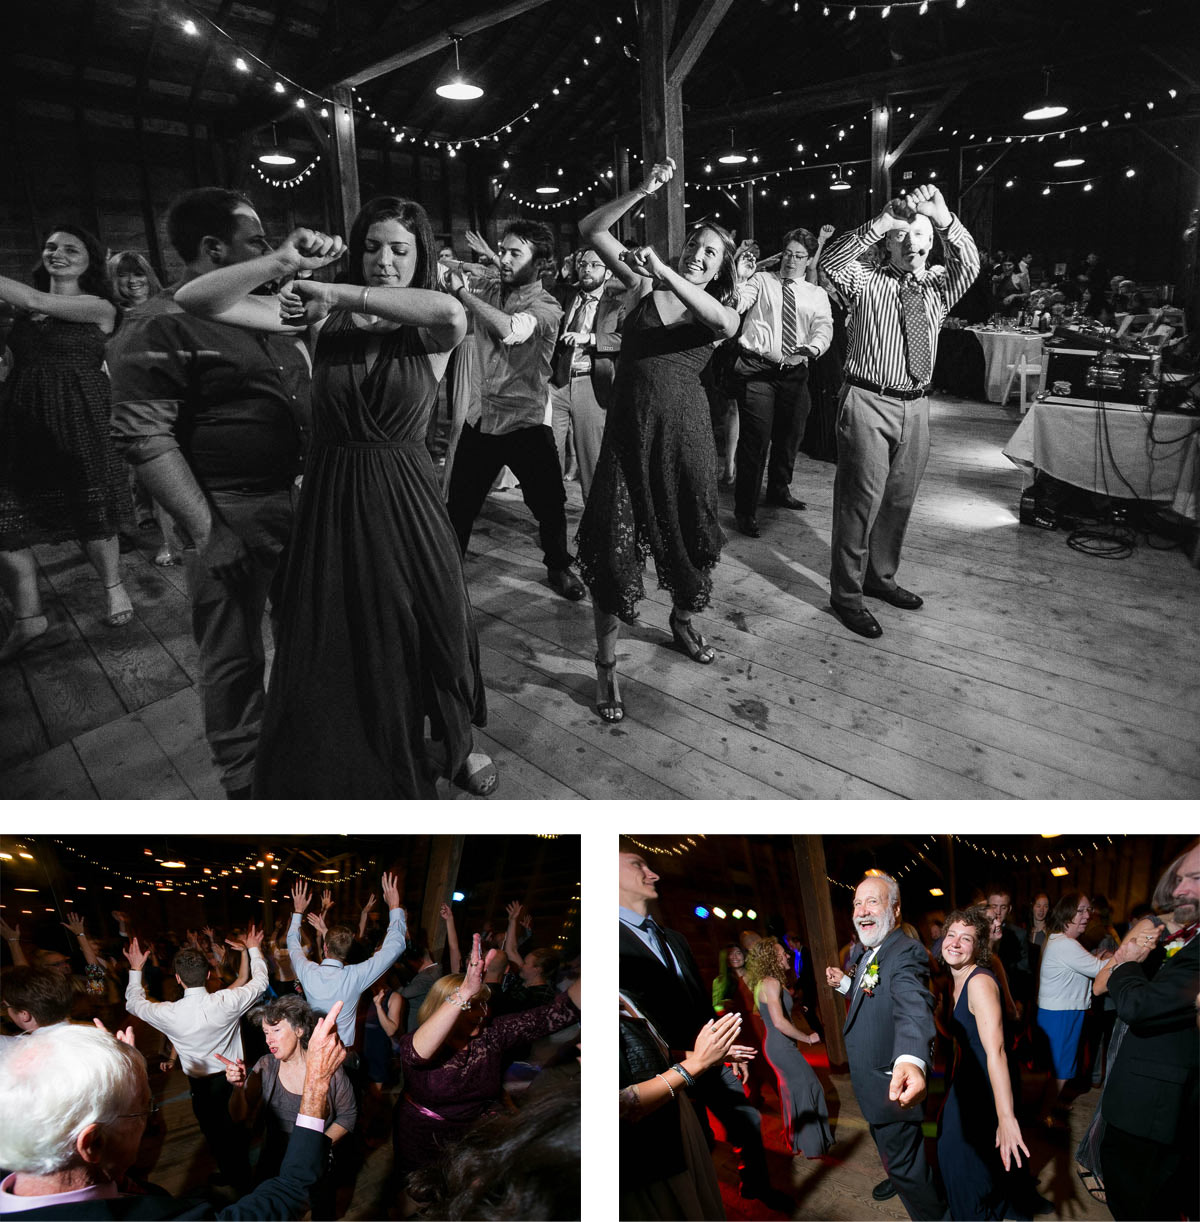 hancock_shaker_village_wedding_0063.jpg